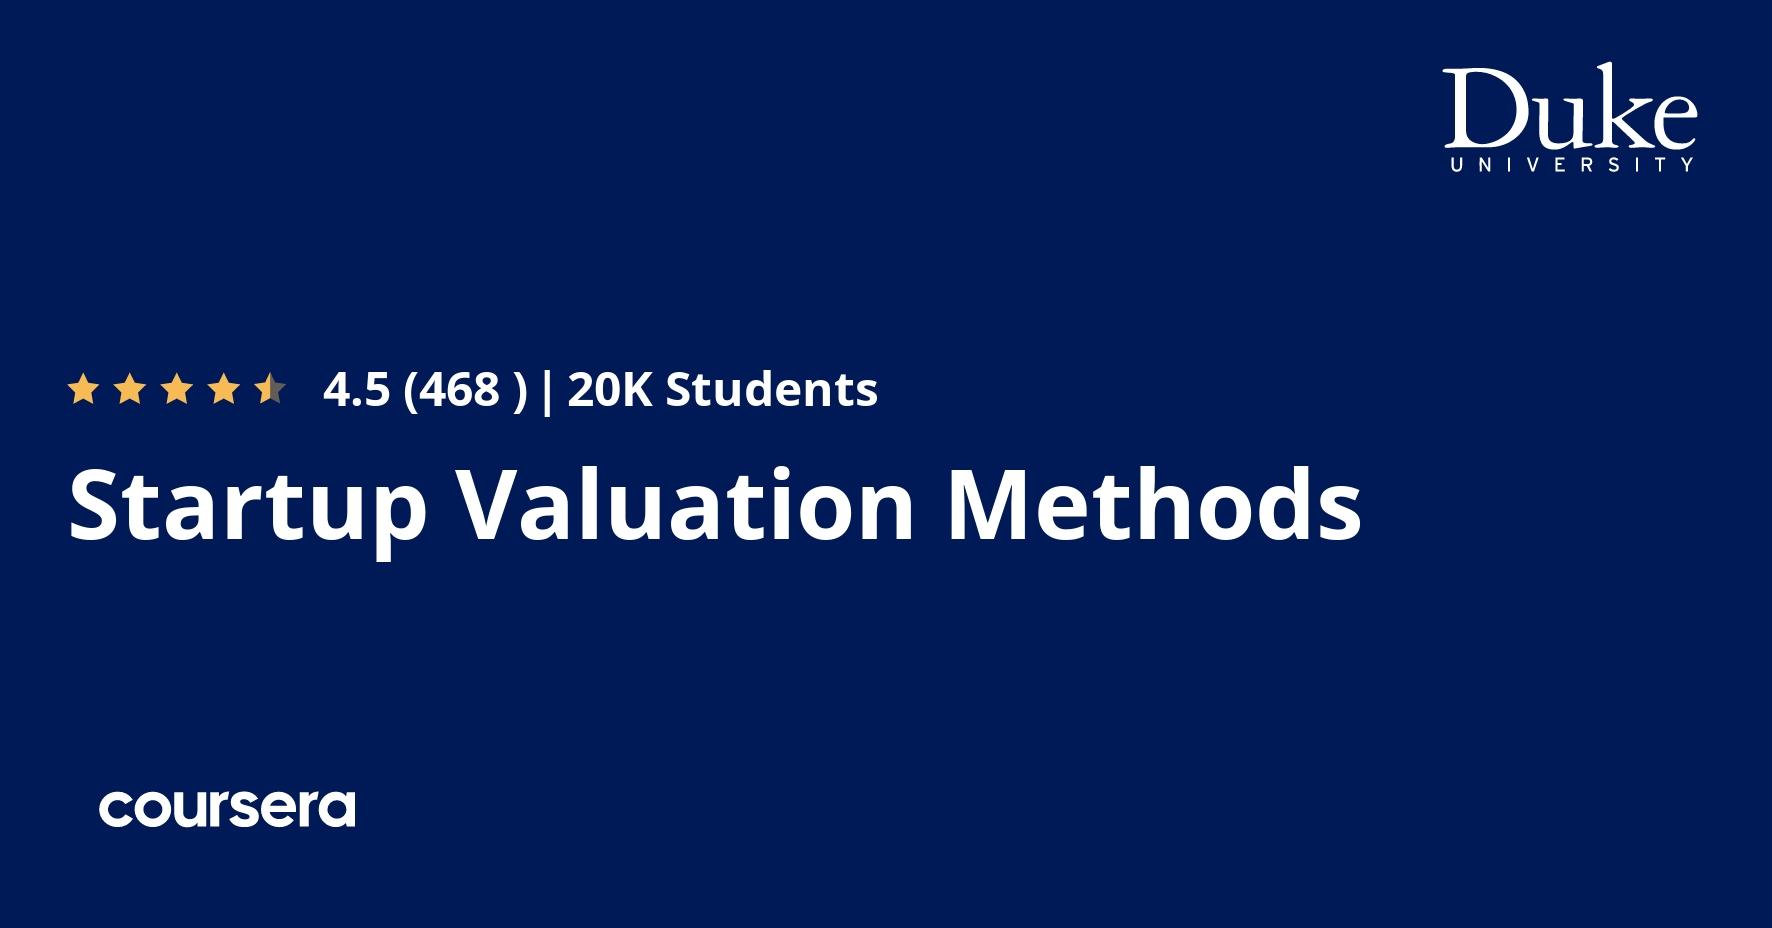 Startup Valuation Methods